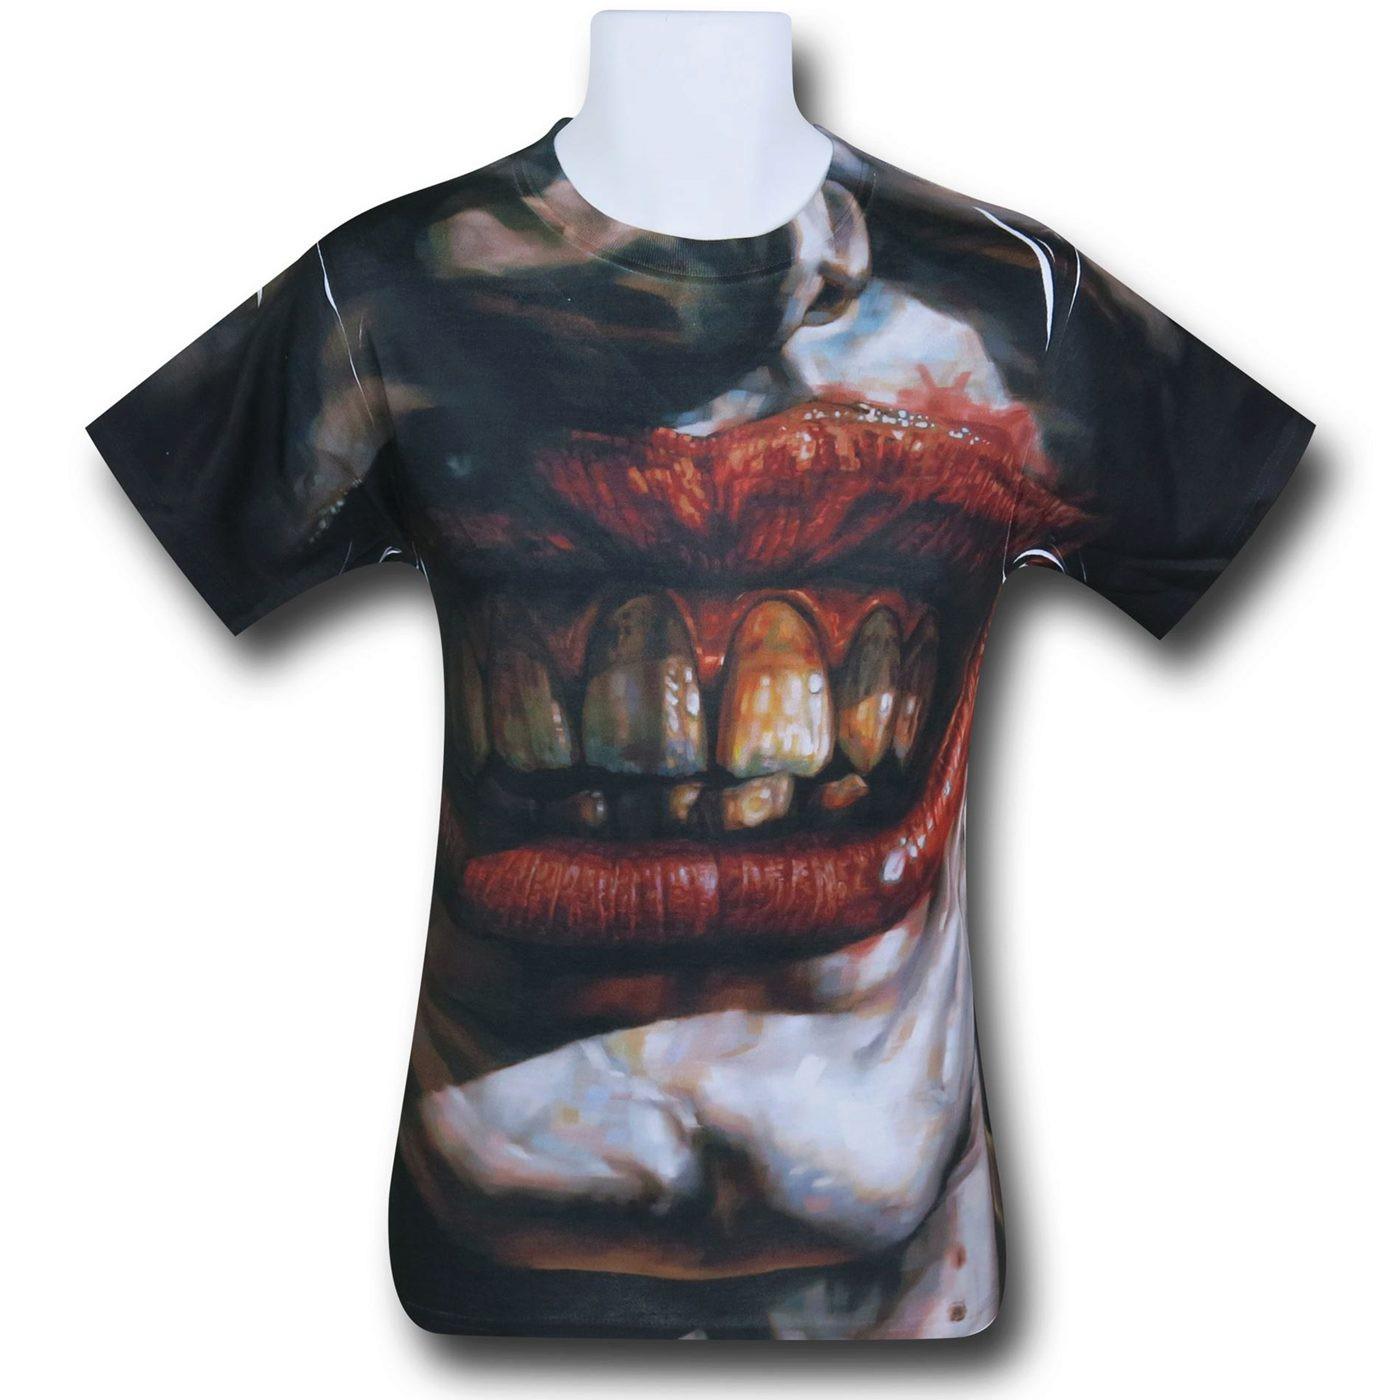 Joker Asylum Sublimated T-Shirt